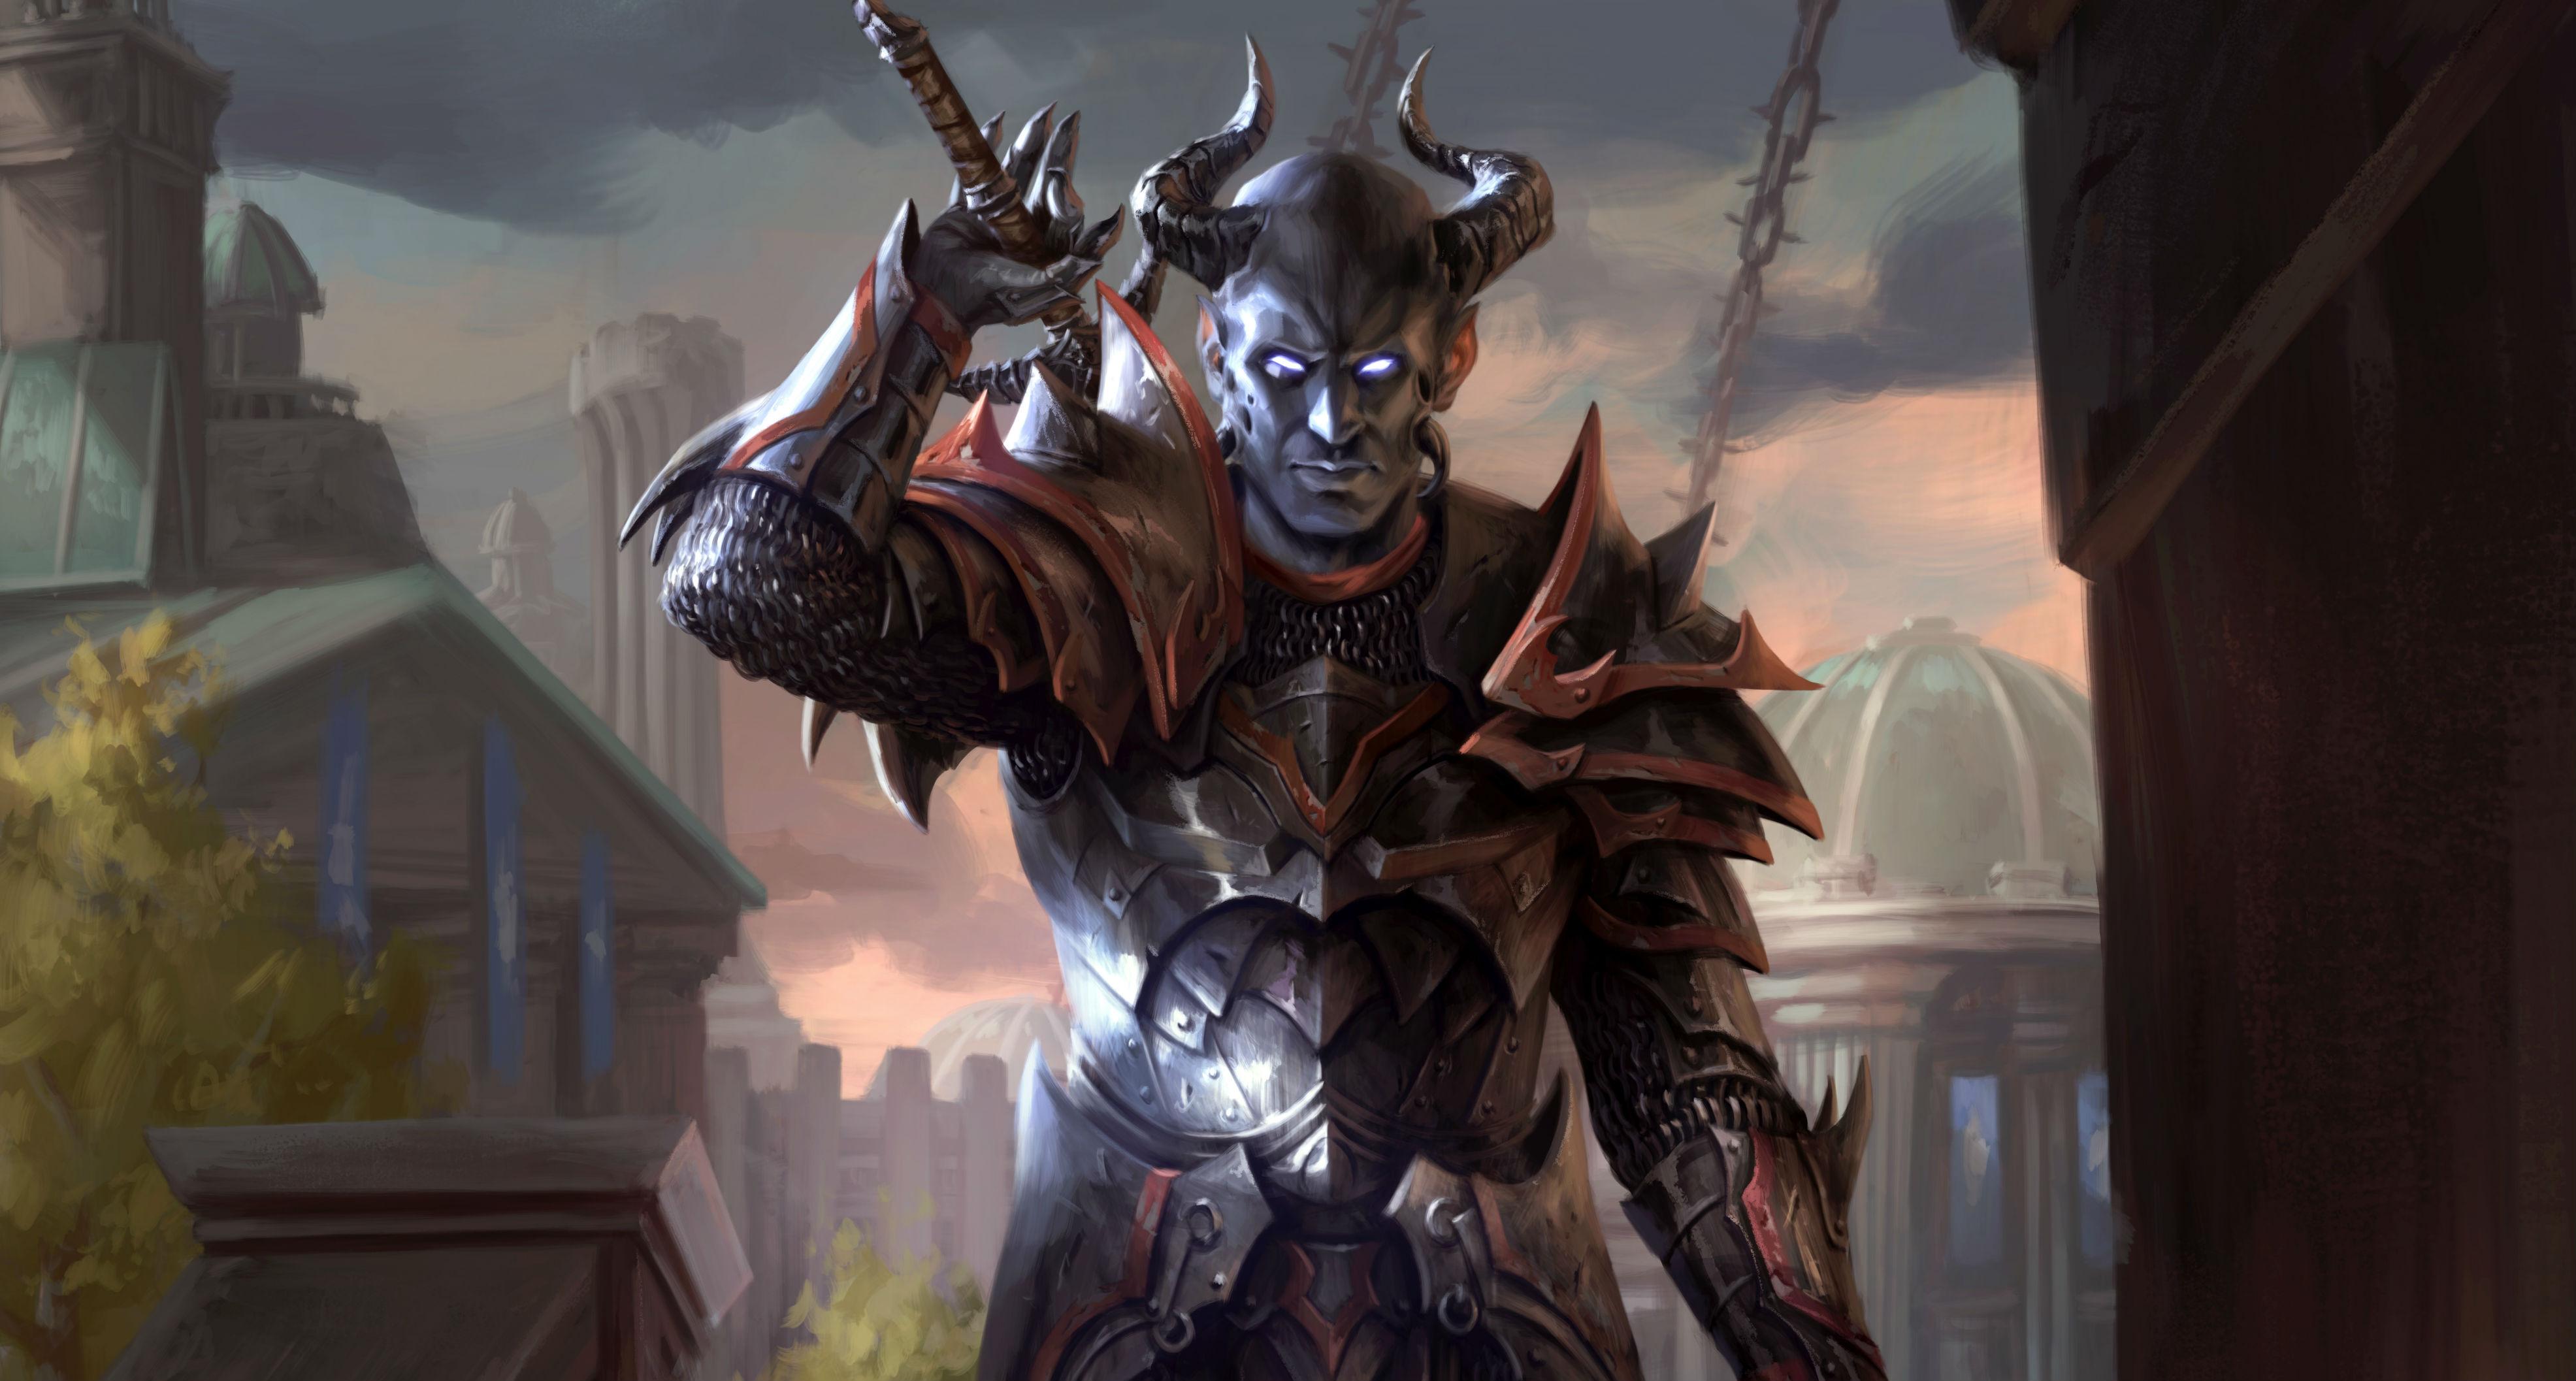 Here's an exclusive card reveal for The Elder Scrolls: Legends' Alliance War expansion screenshot